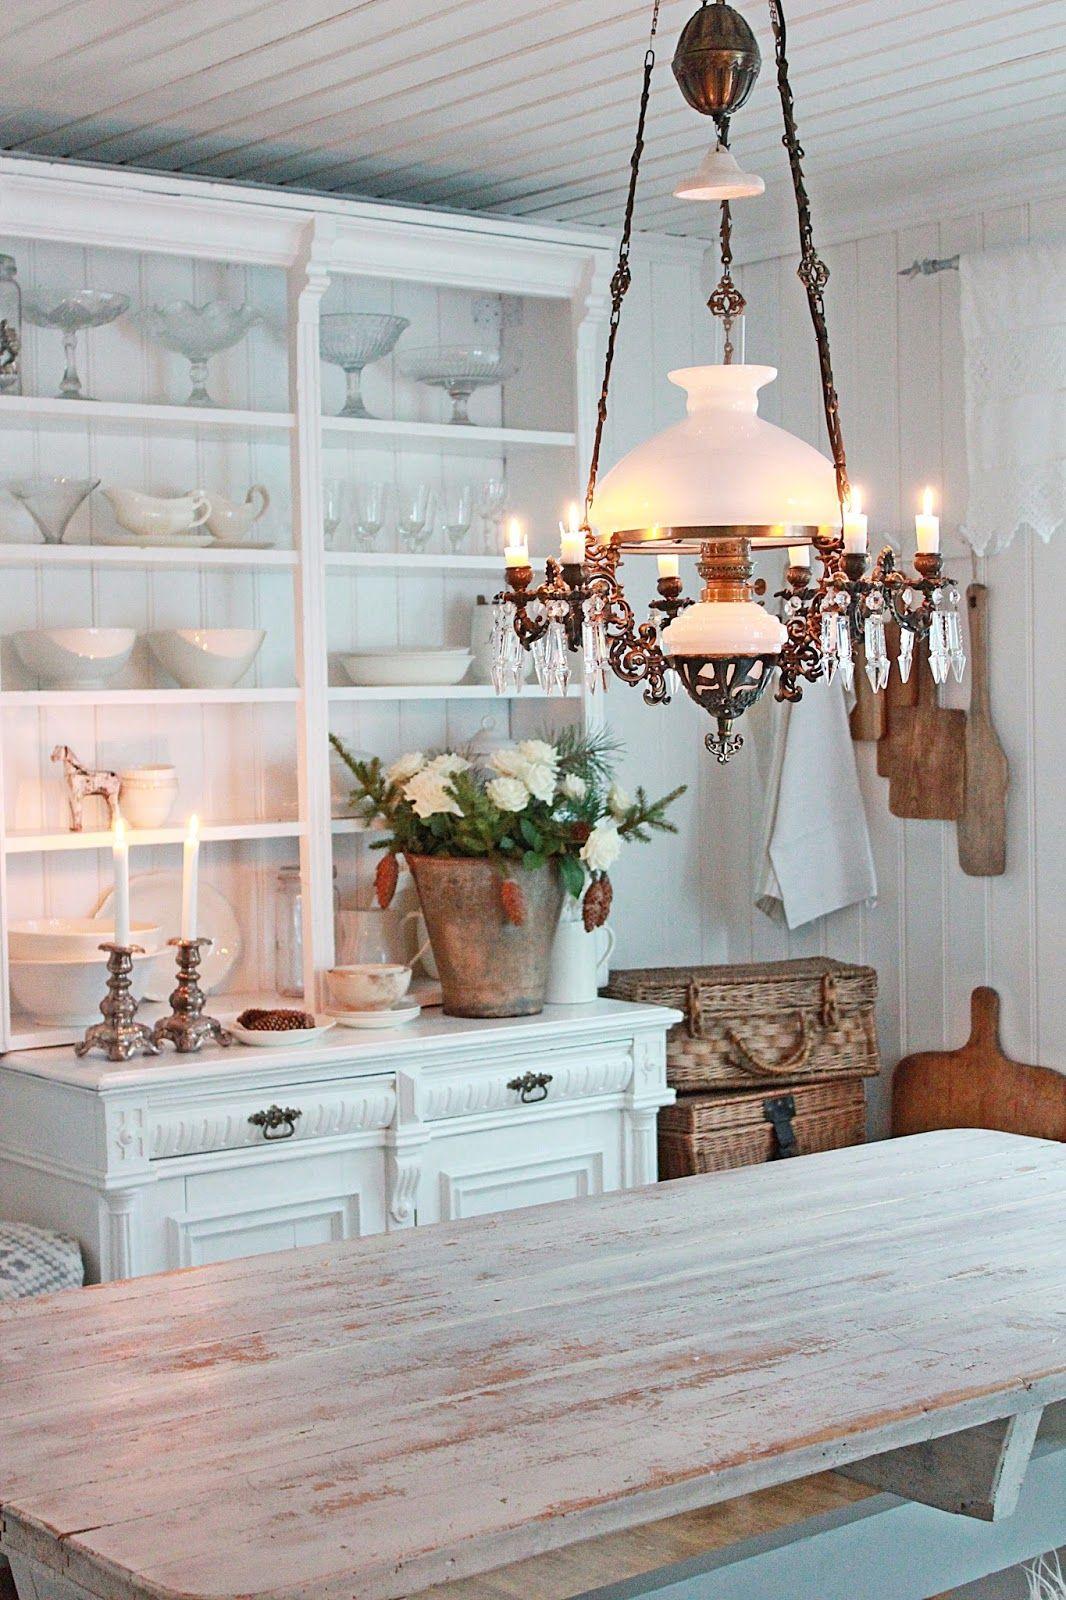 pin von magdalena auf ovi renovation inspirations pinterest vintage m bel esszimmer und. Black Bedroom Furniture Sets. Home Design Ideas